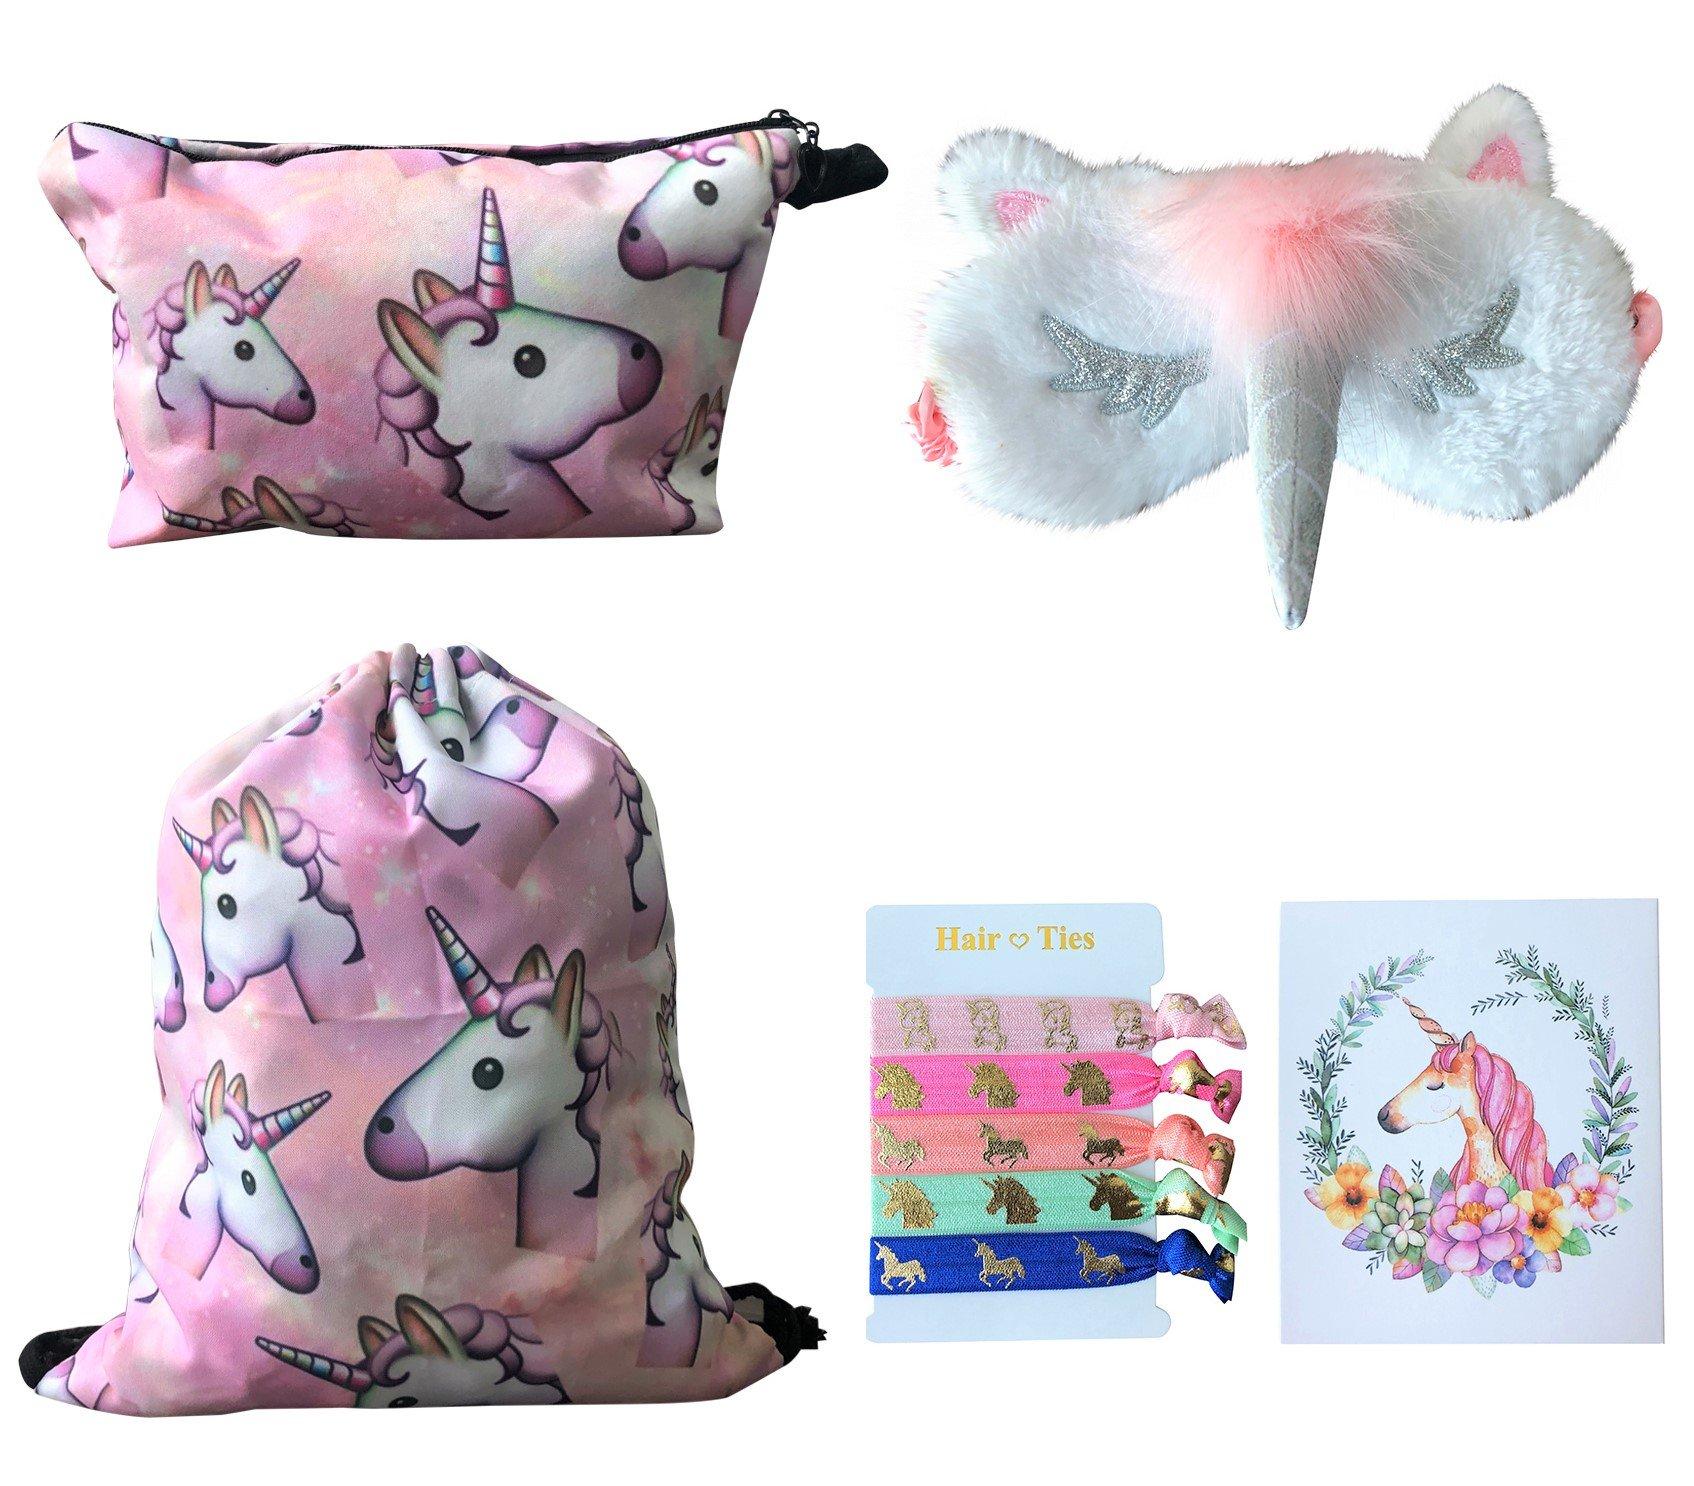 Unicorn Gifts for Girls 5 Pack - Unicorn Drawstring Backpack/Makeup Bag/Eye Mask/Hair Ties/Card (Pink)